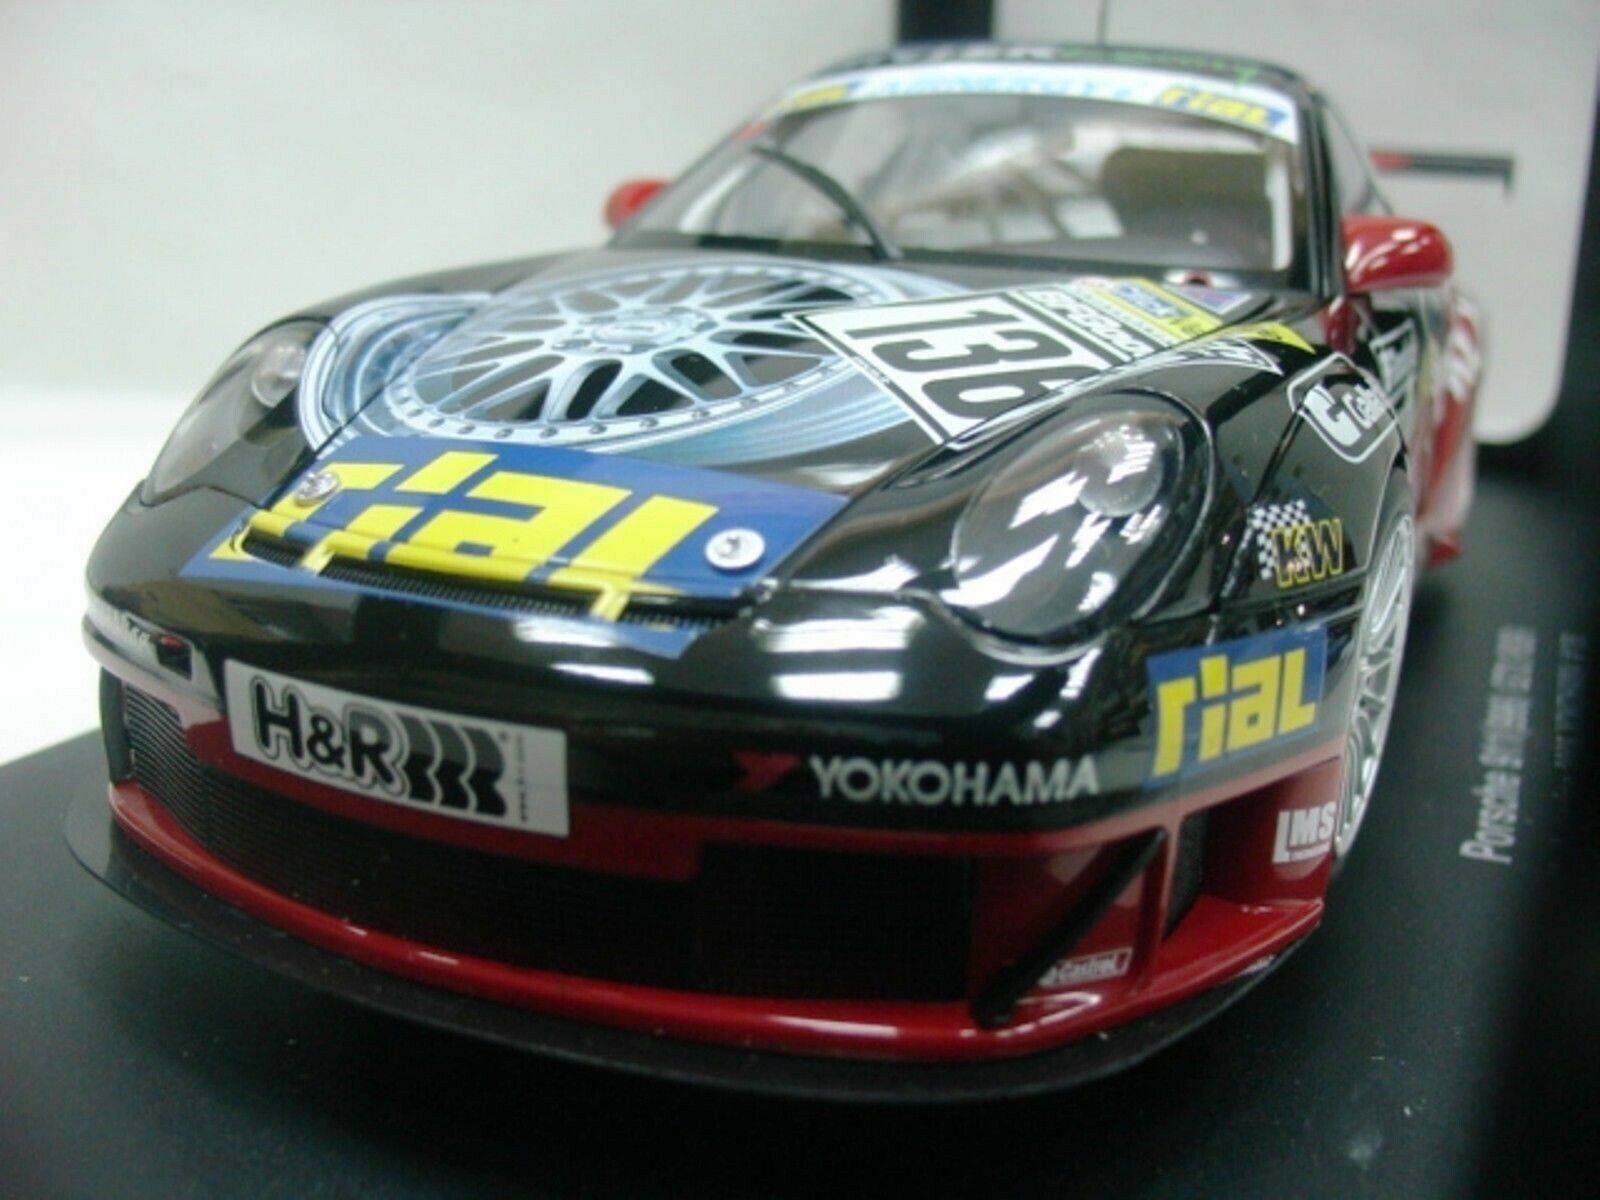 WOW EXTREMELY  RARE Porsche 996 911 GT3RSR VLN Nurburgbague 2005 1 18 Auto Art-997  meilleur prix